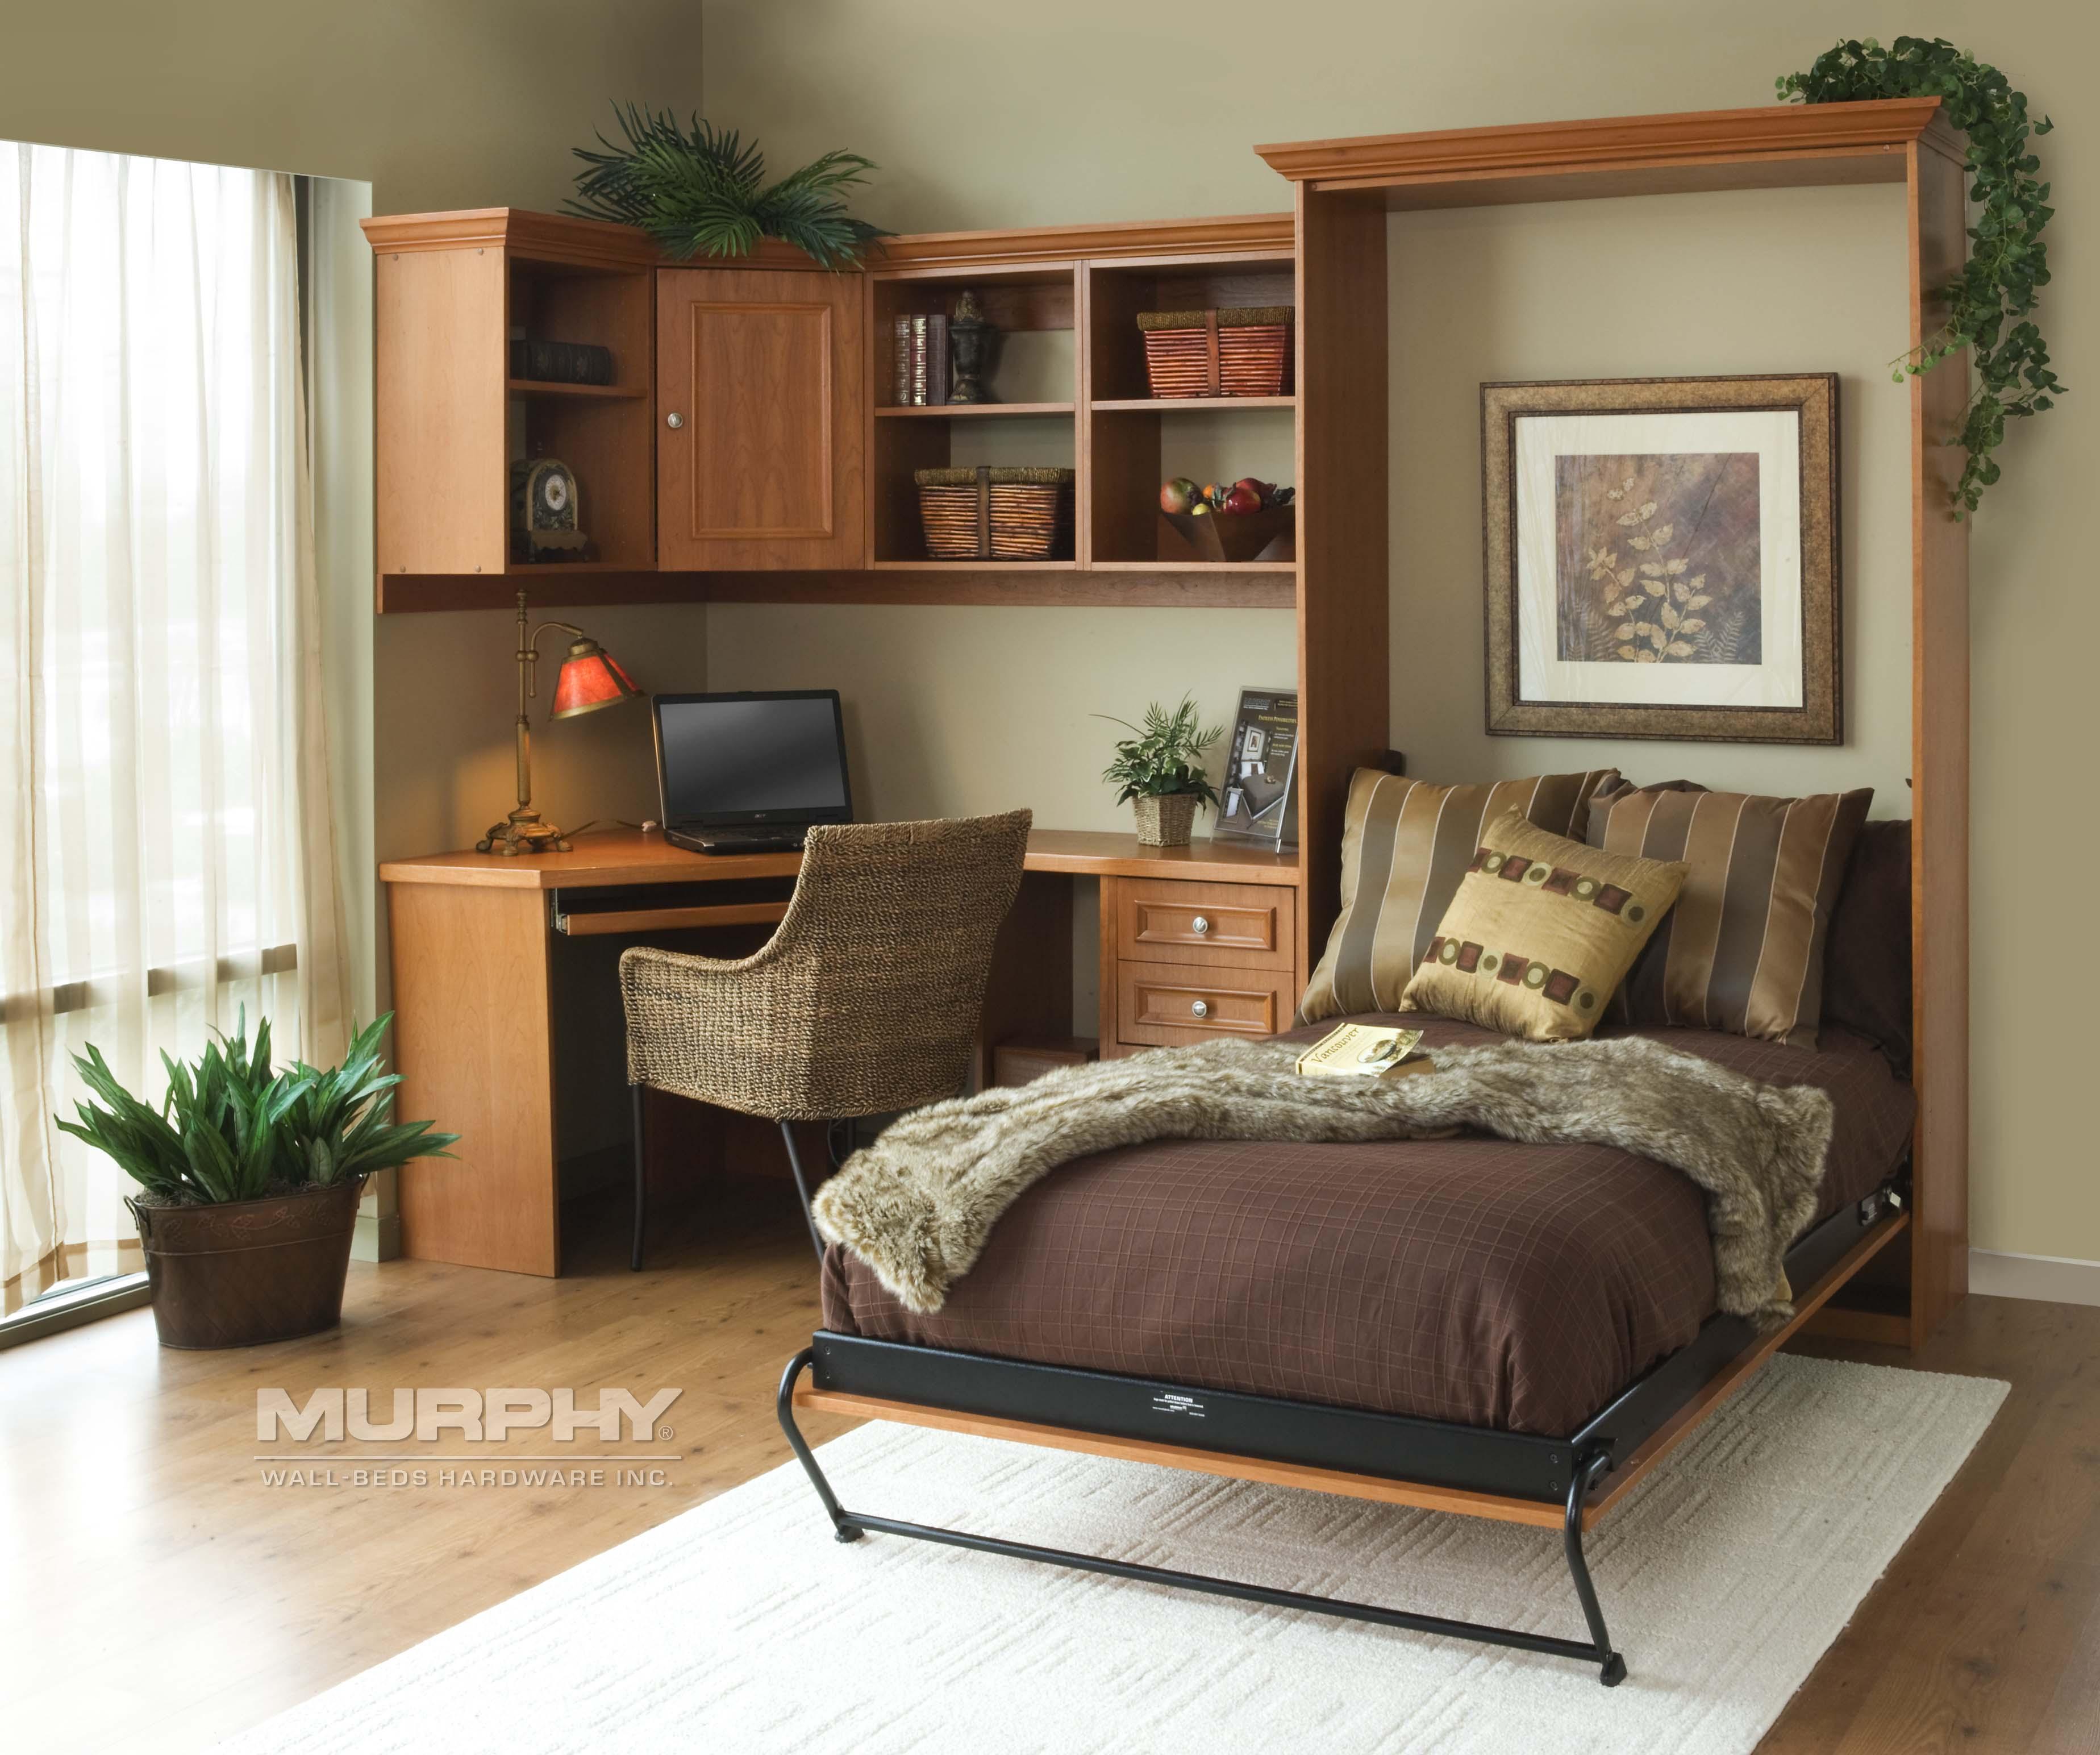 Murphy beds for Murphy beds san francisco